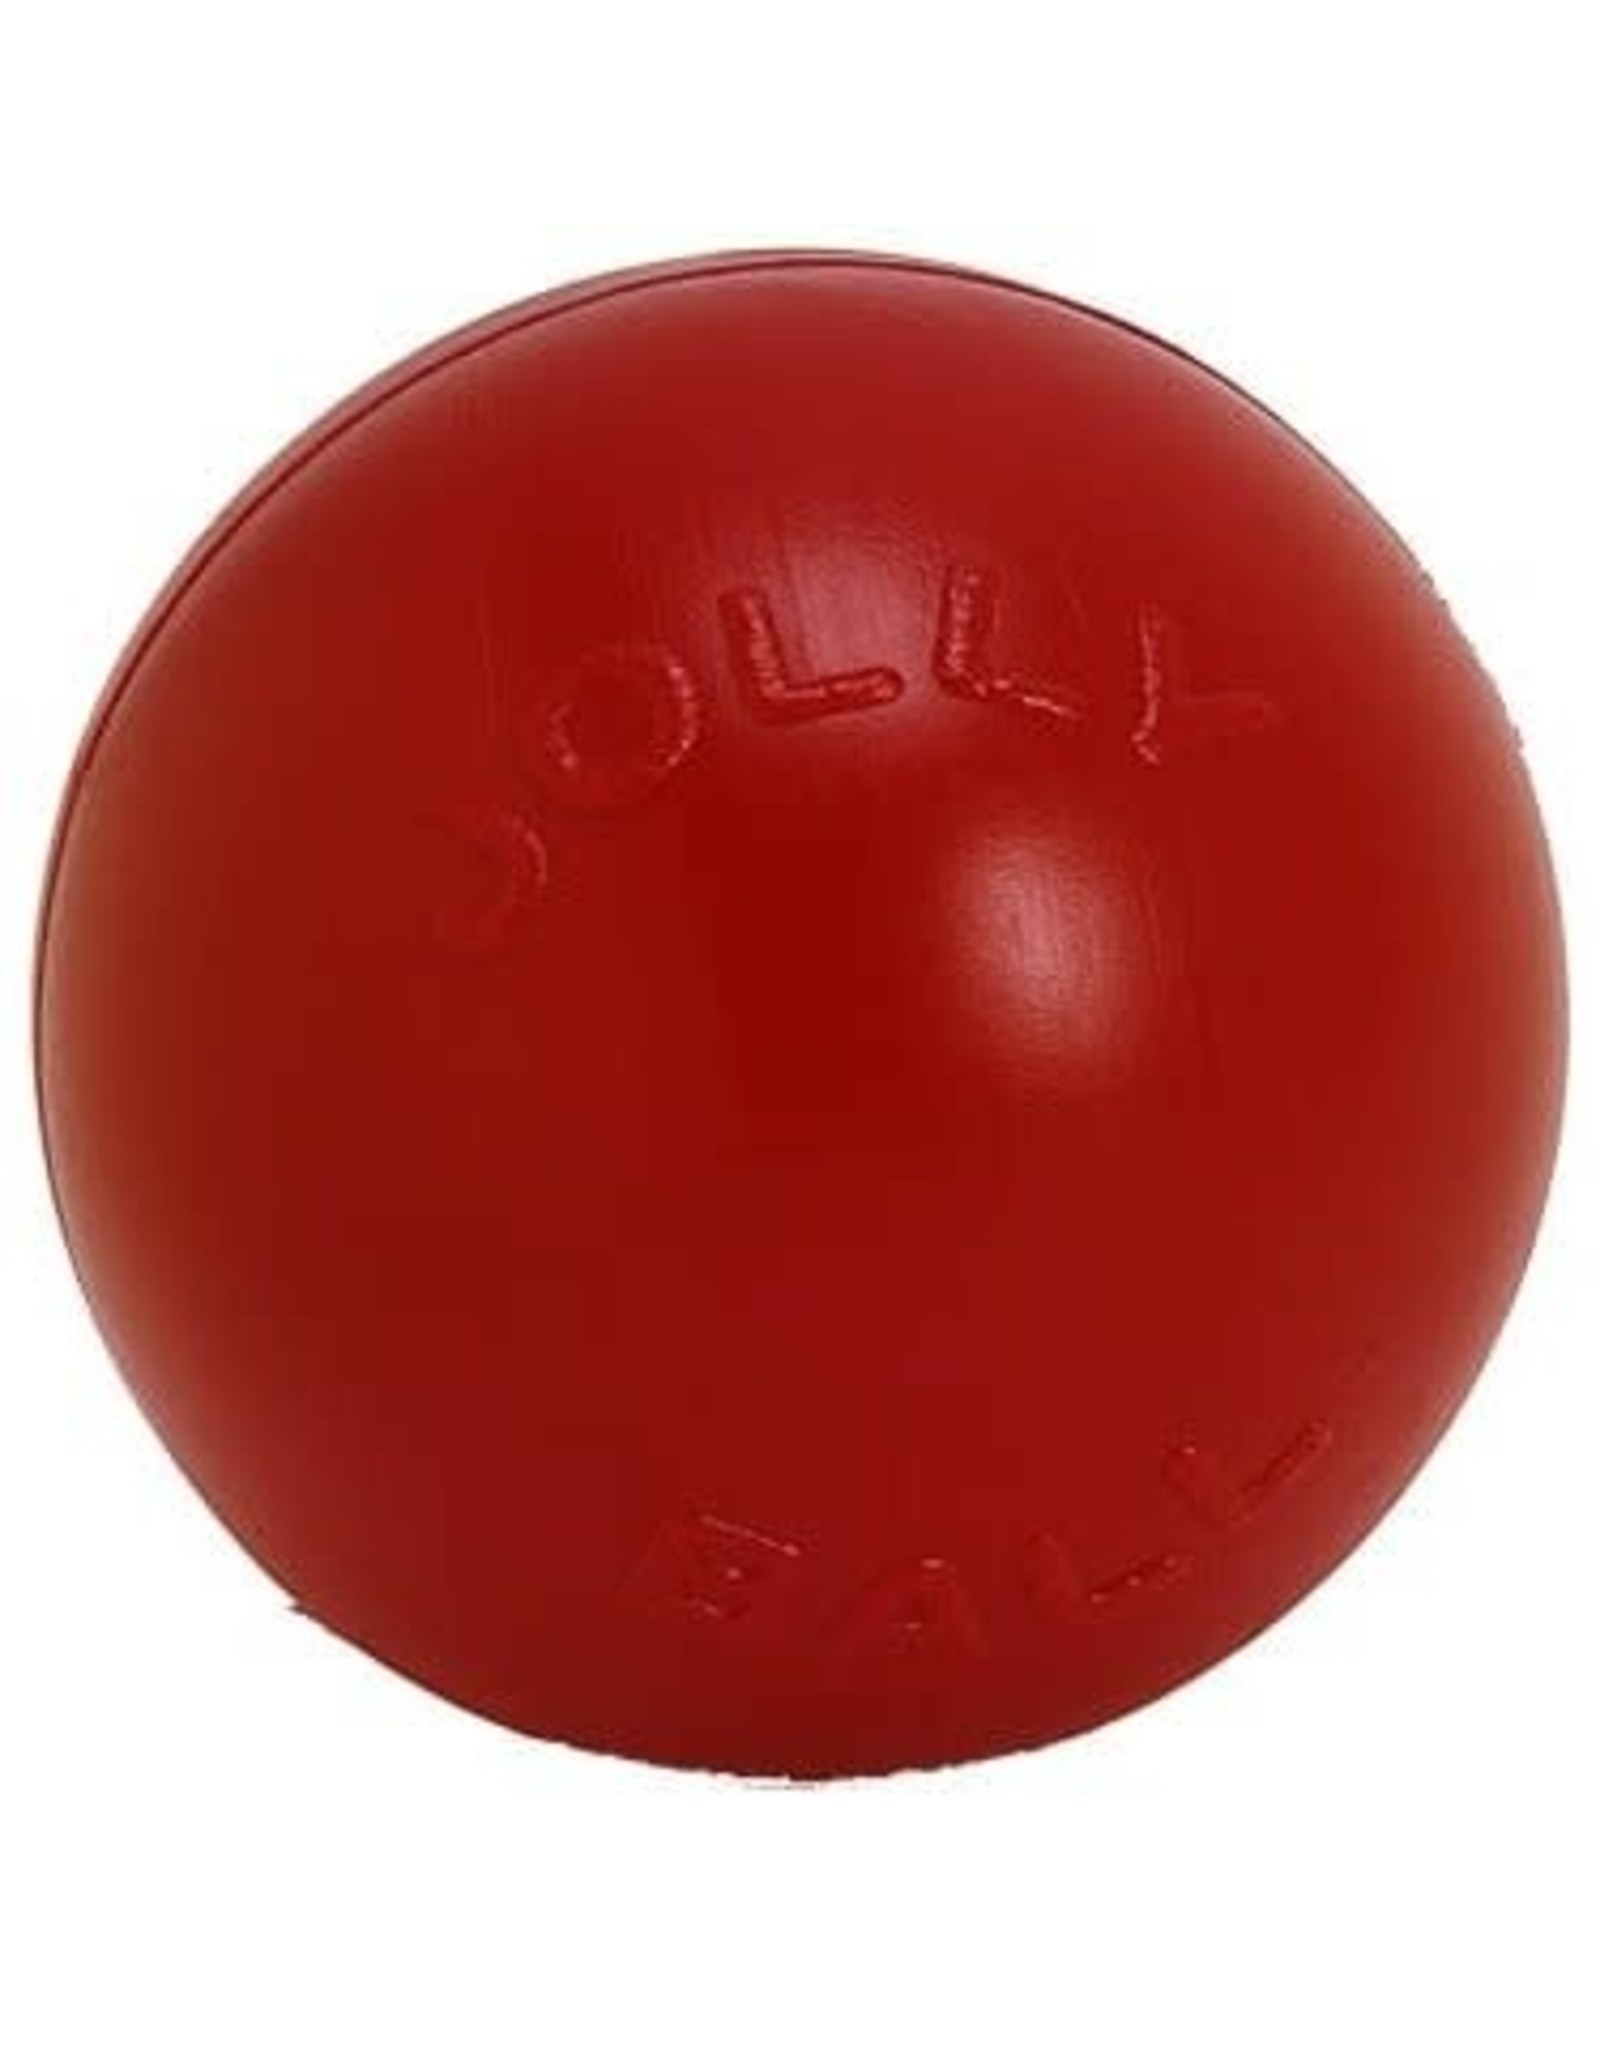 Jolly Pet JOLLYPET Push-n-Play 4.5in Red